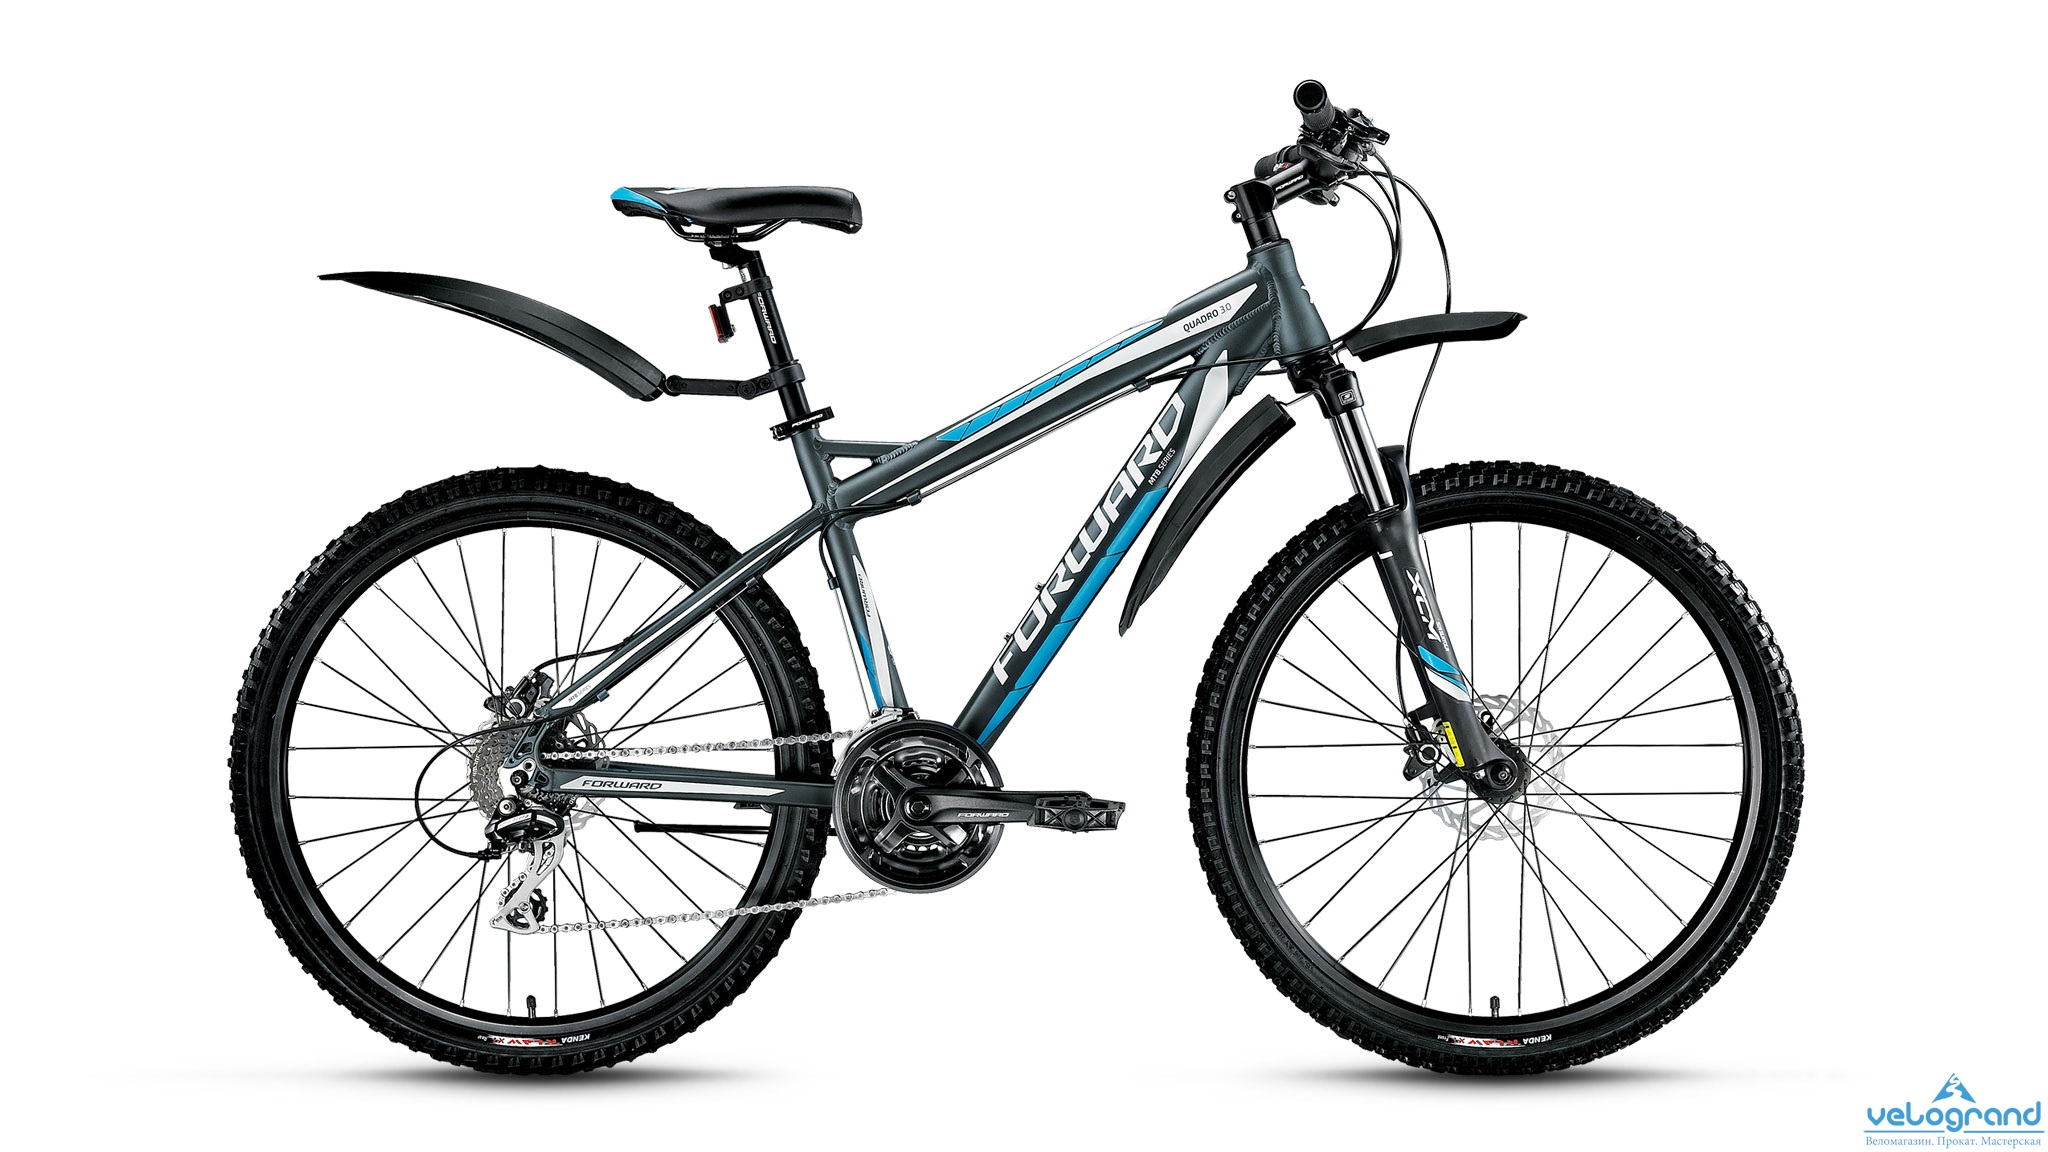 Горный велосипед Forward Quadro 3.0 disc (2016), Цвет Серый, Размер 17